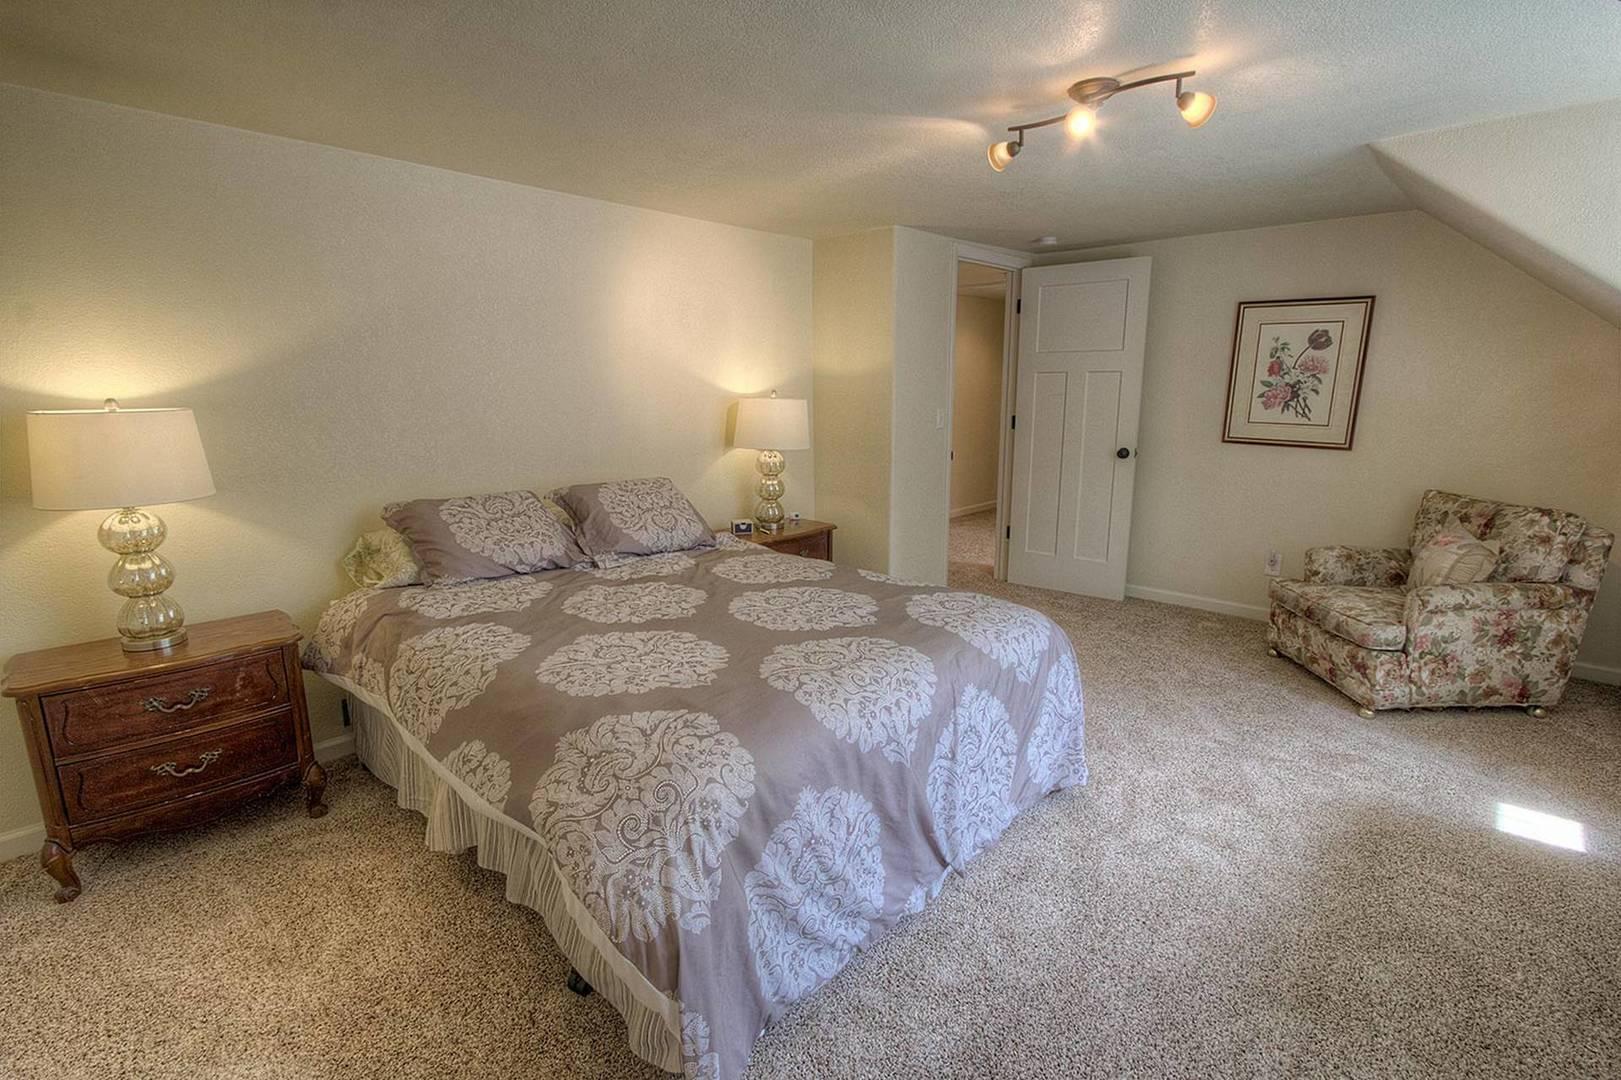 cyh1098 bedroom